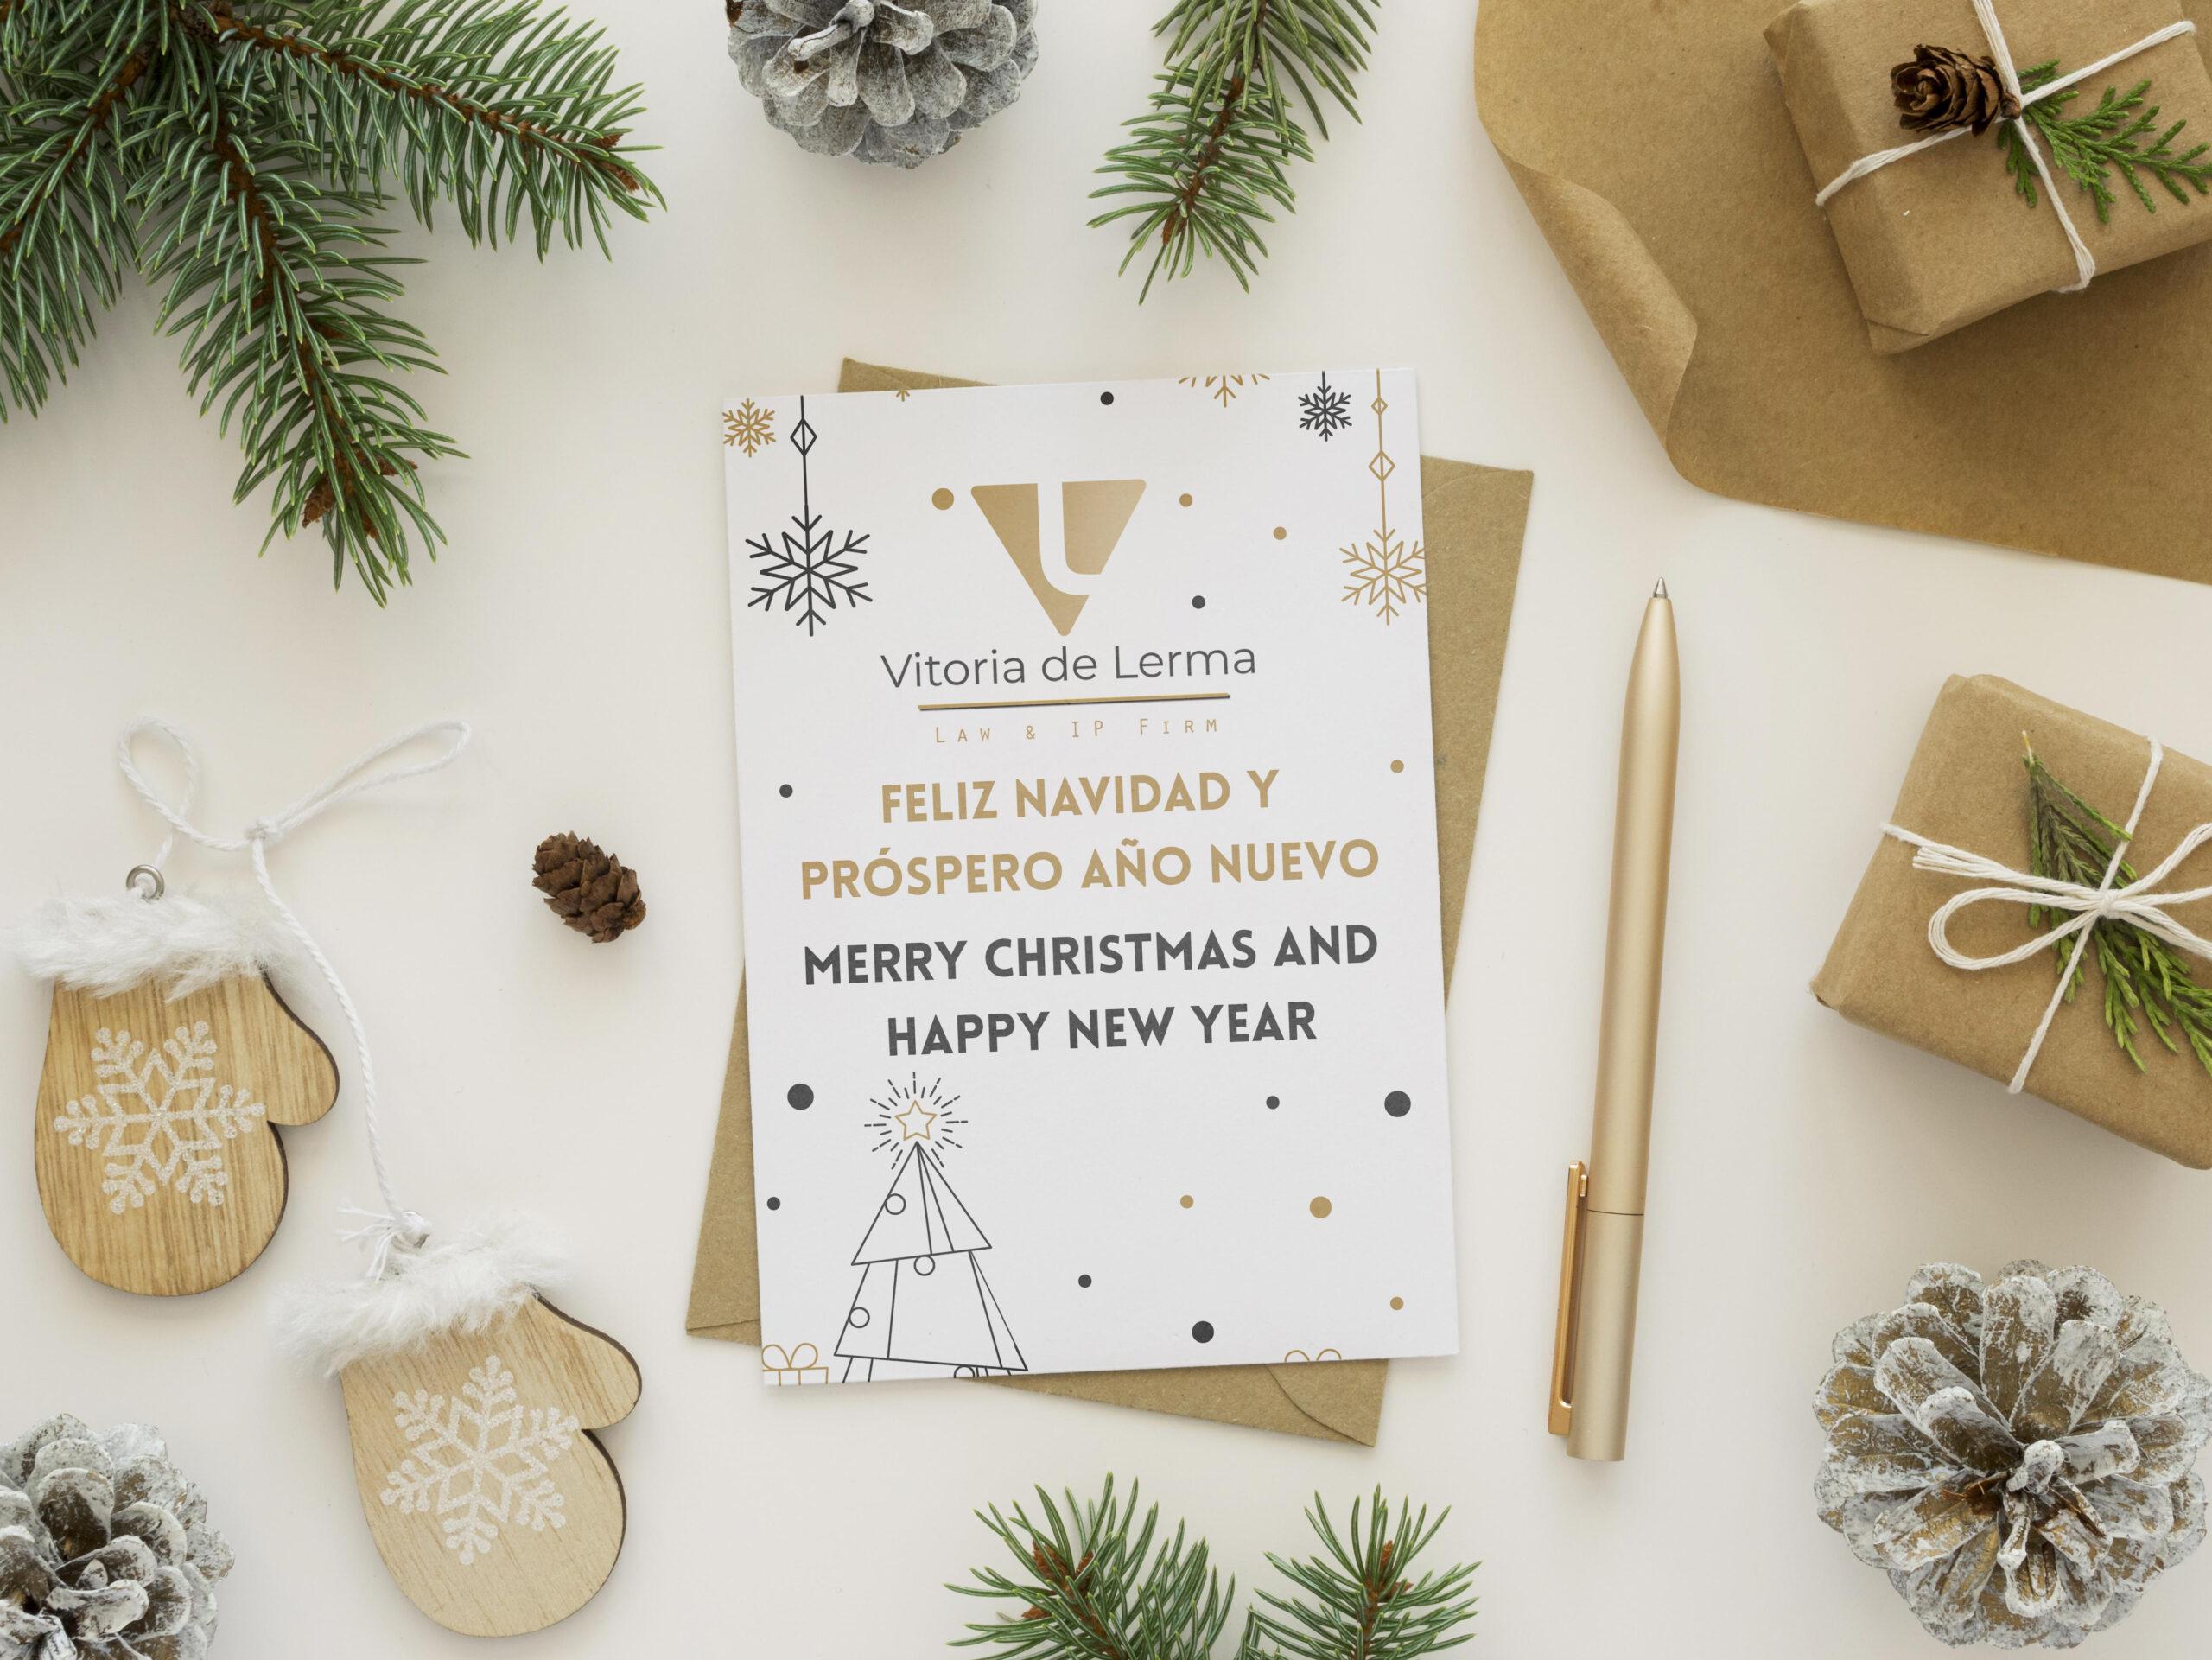 Vitoria de Lerma wishes you a Merry Christmas